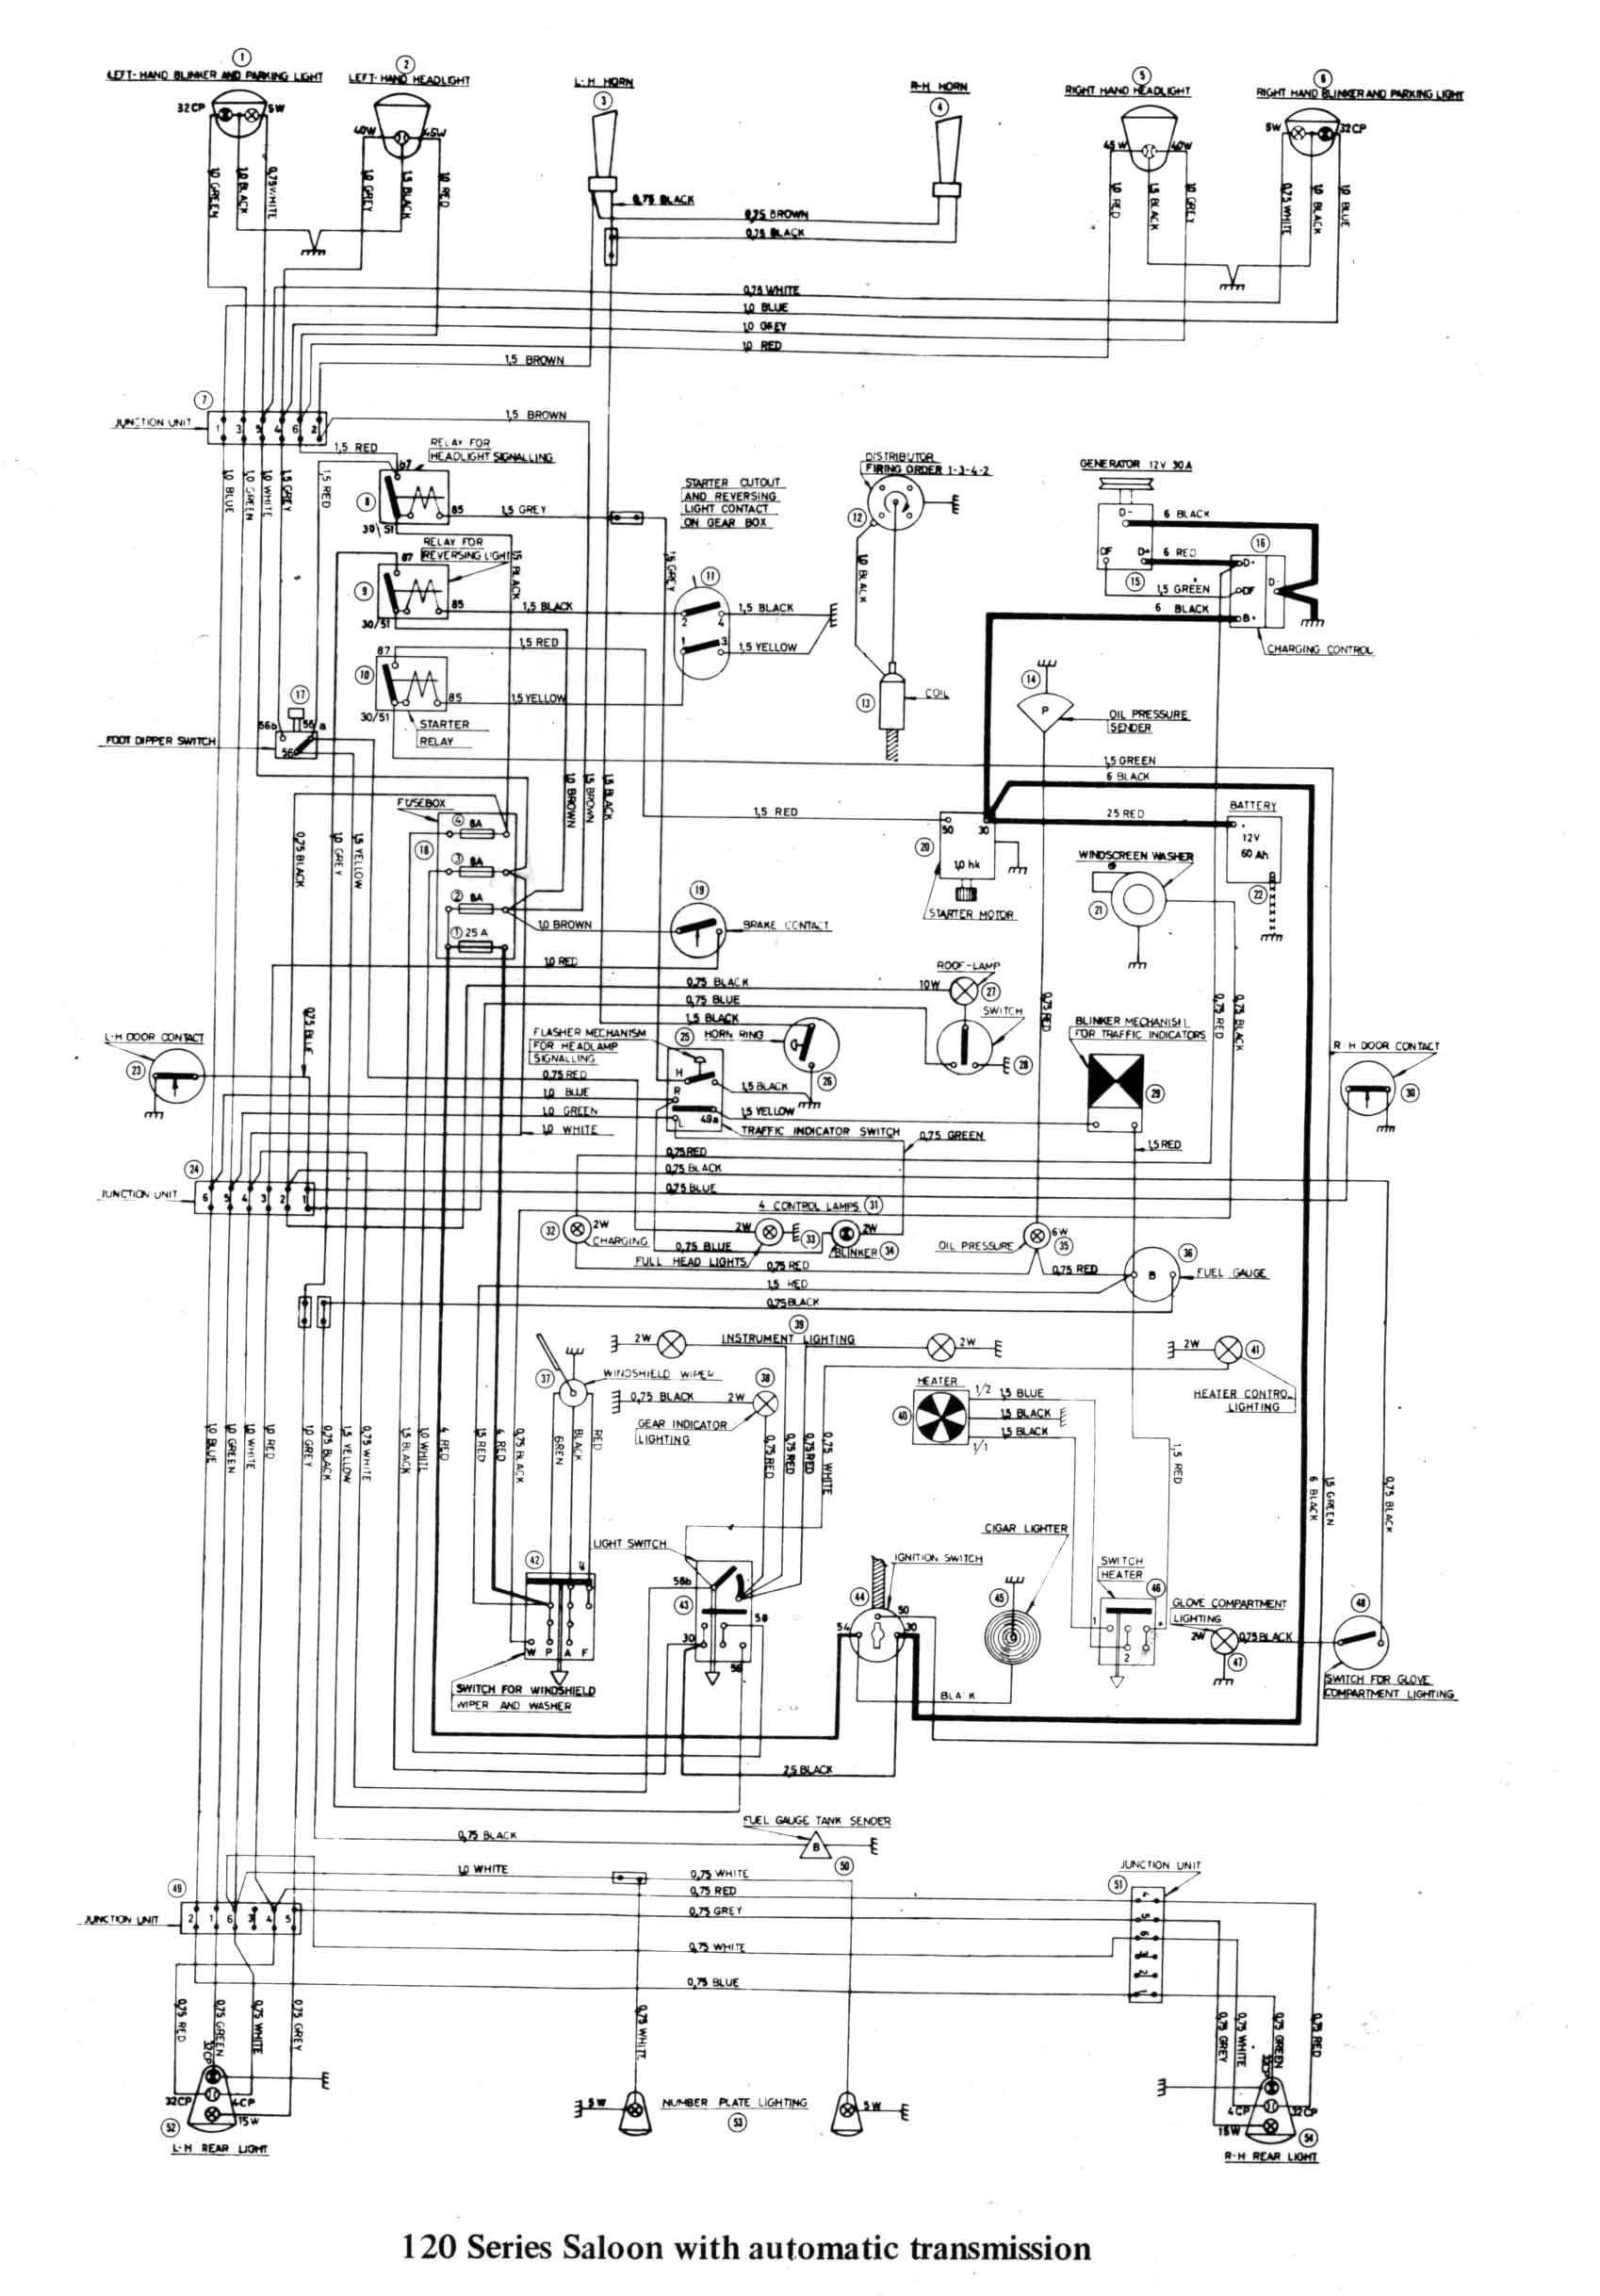 Turn Signal Wire Diagram Turn Signal Wiring Diagram New Sw Em Od Retrofitting Vintage Volvo Of Turn Signal Wire Diagram